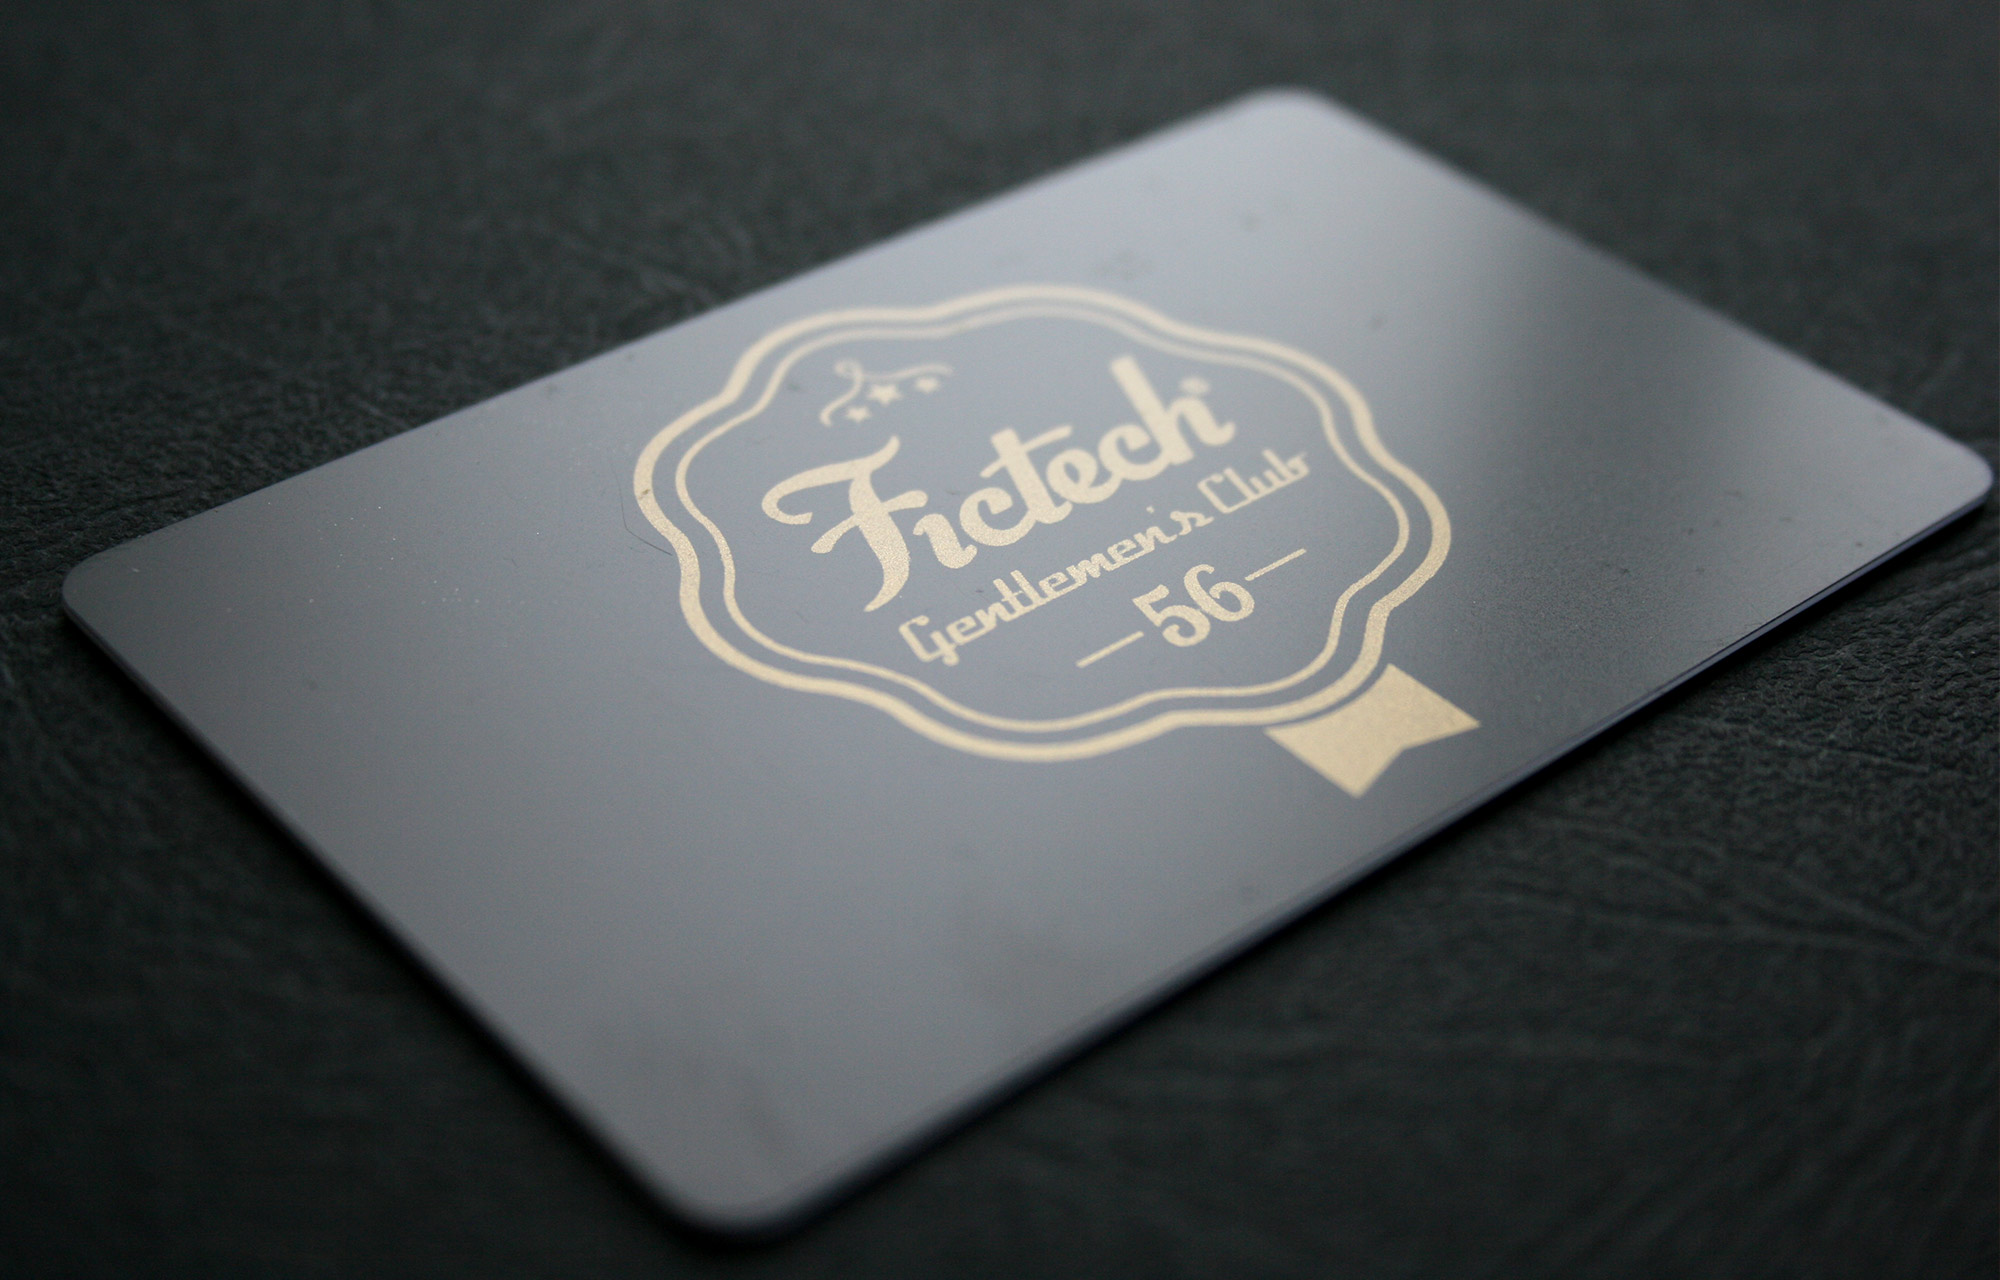 fictech-gentlemens-club